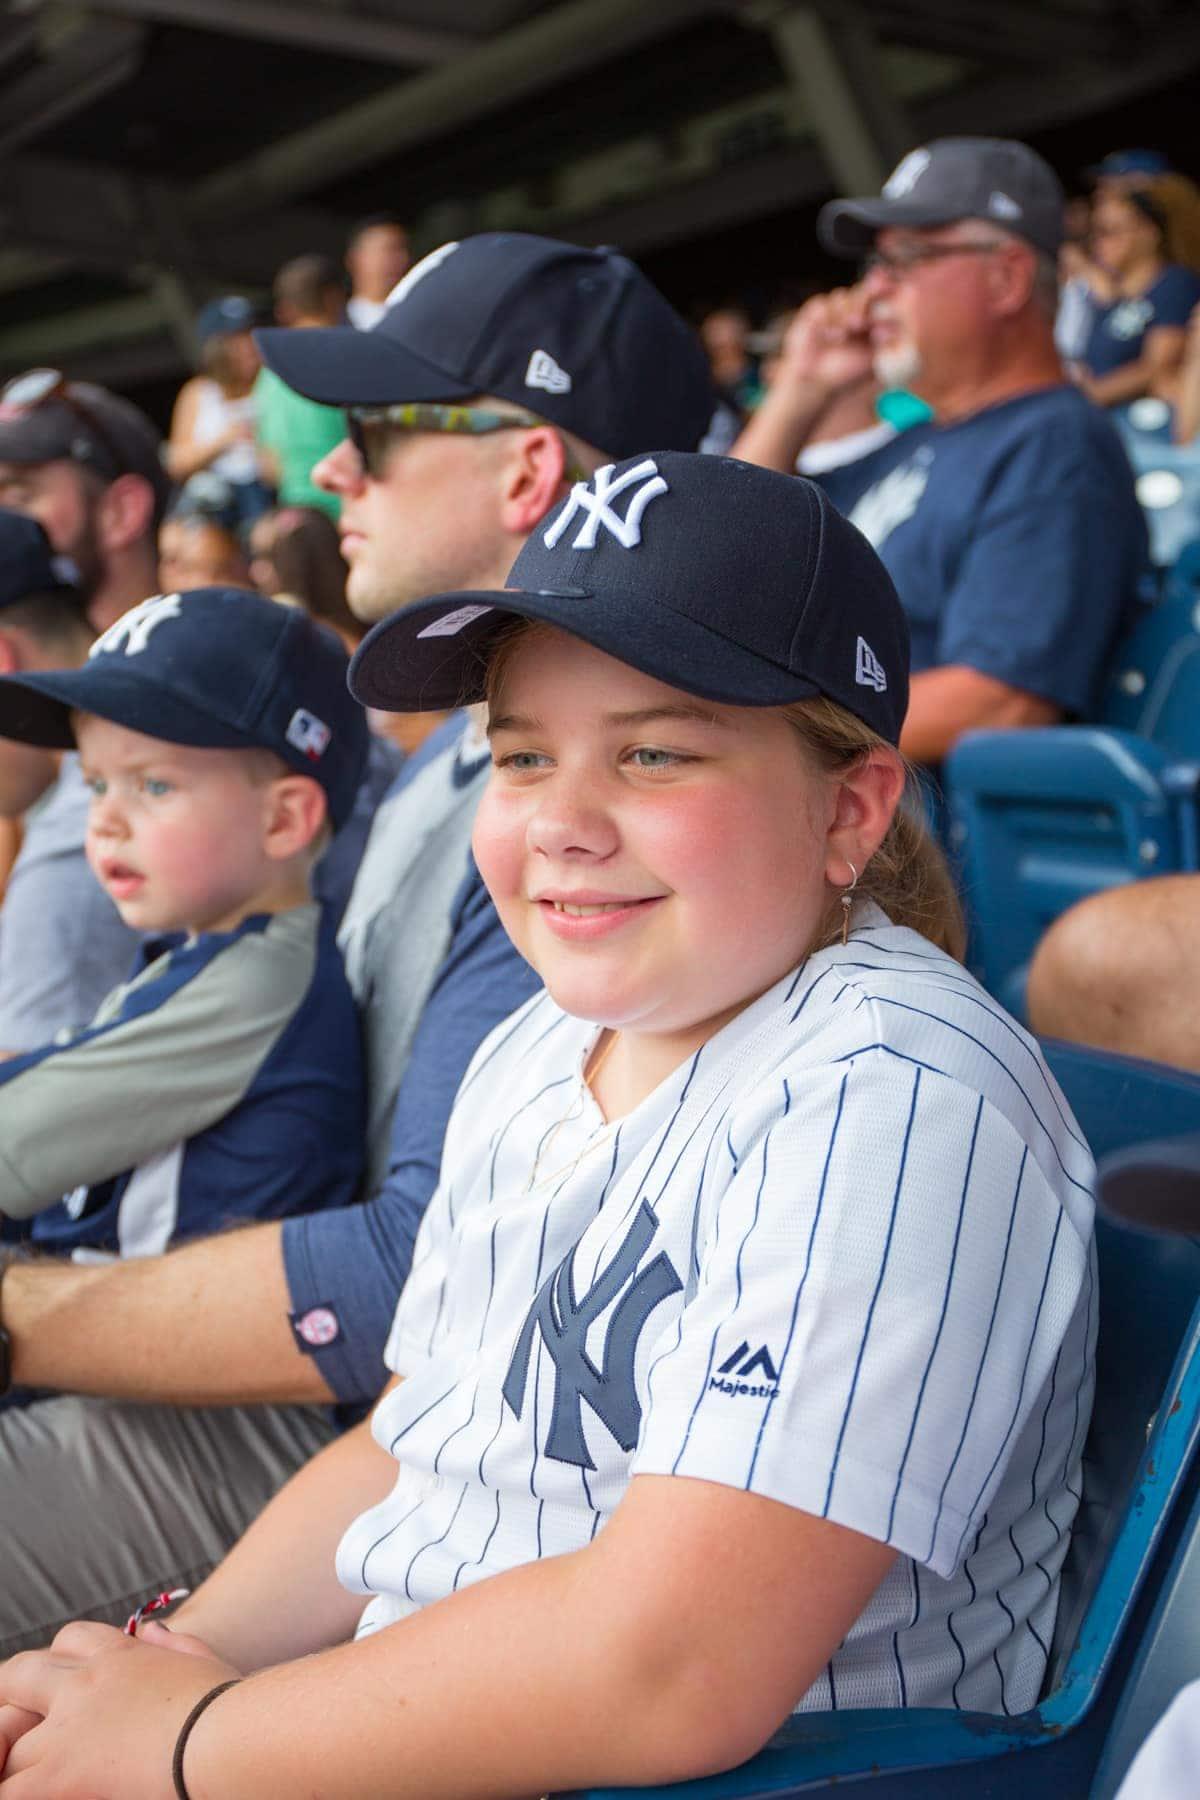 Brooke watching the baseball game